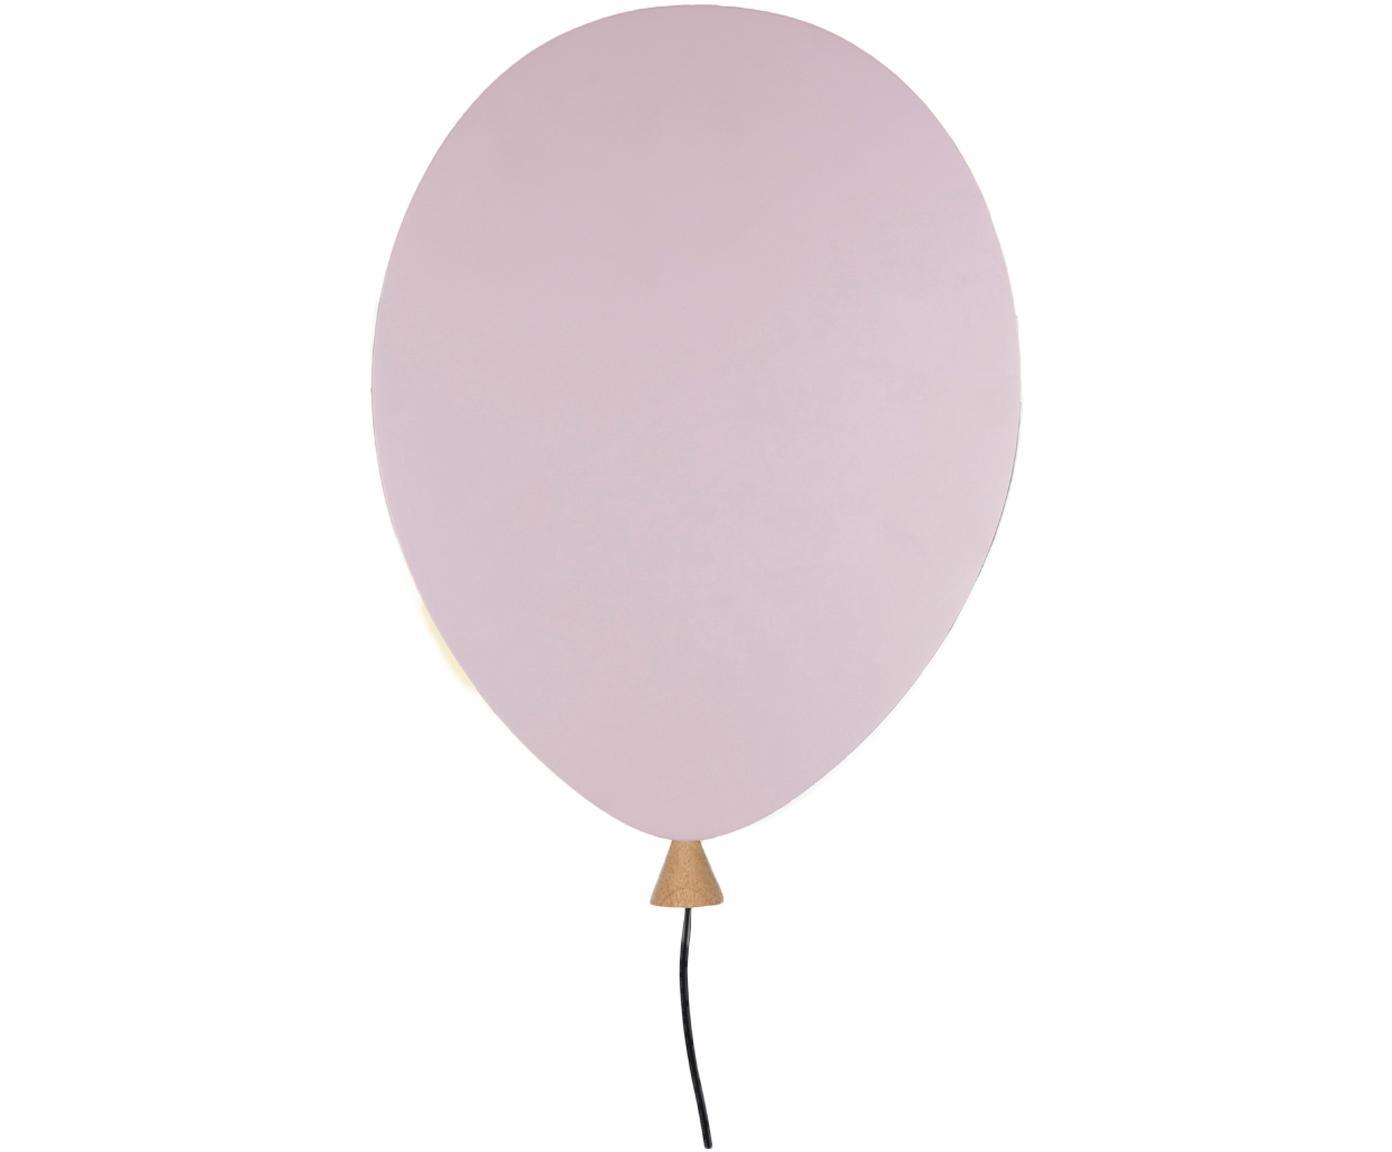 Applique in legno con spina Balloon, Paralume: legno rivestito, Rosa, Larg. 25 x Alt. 35 cm